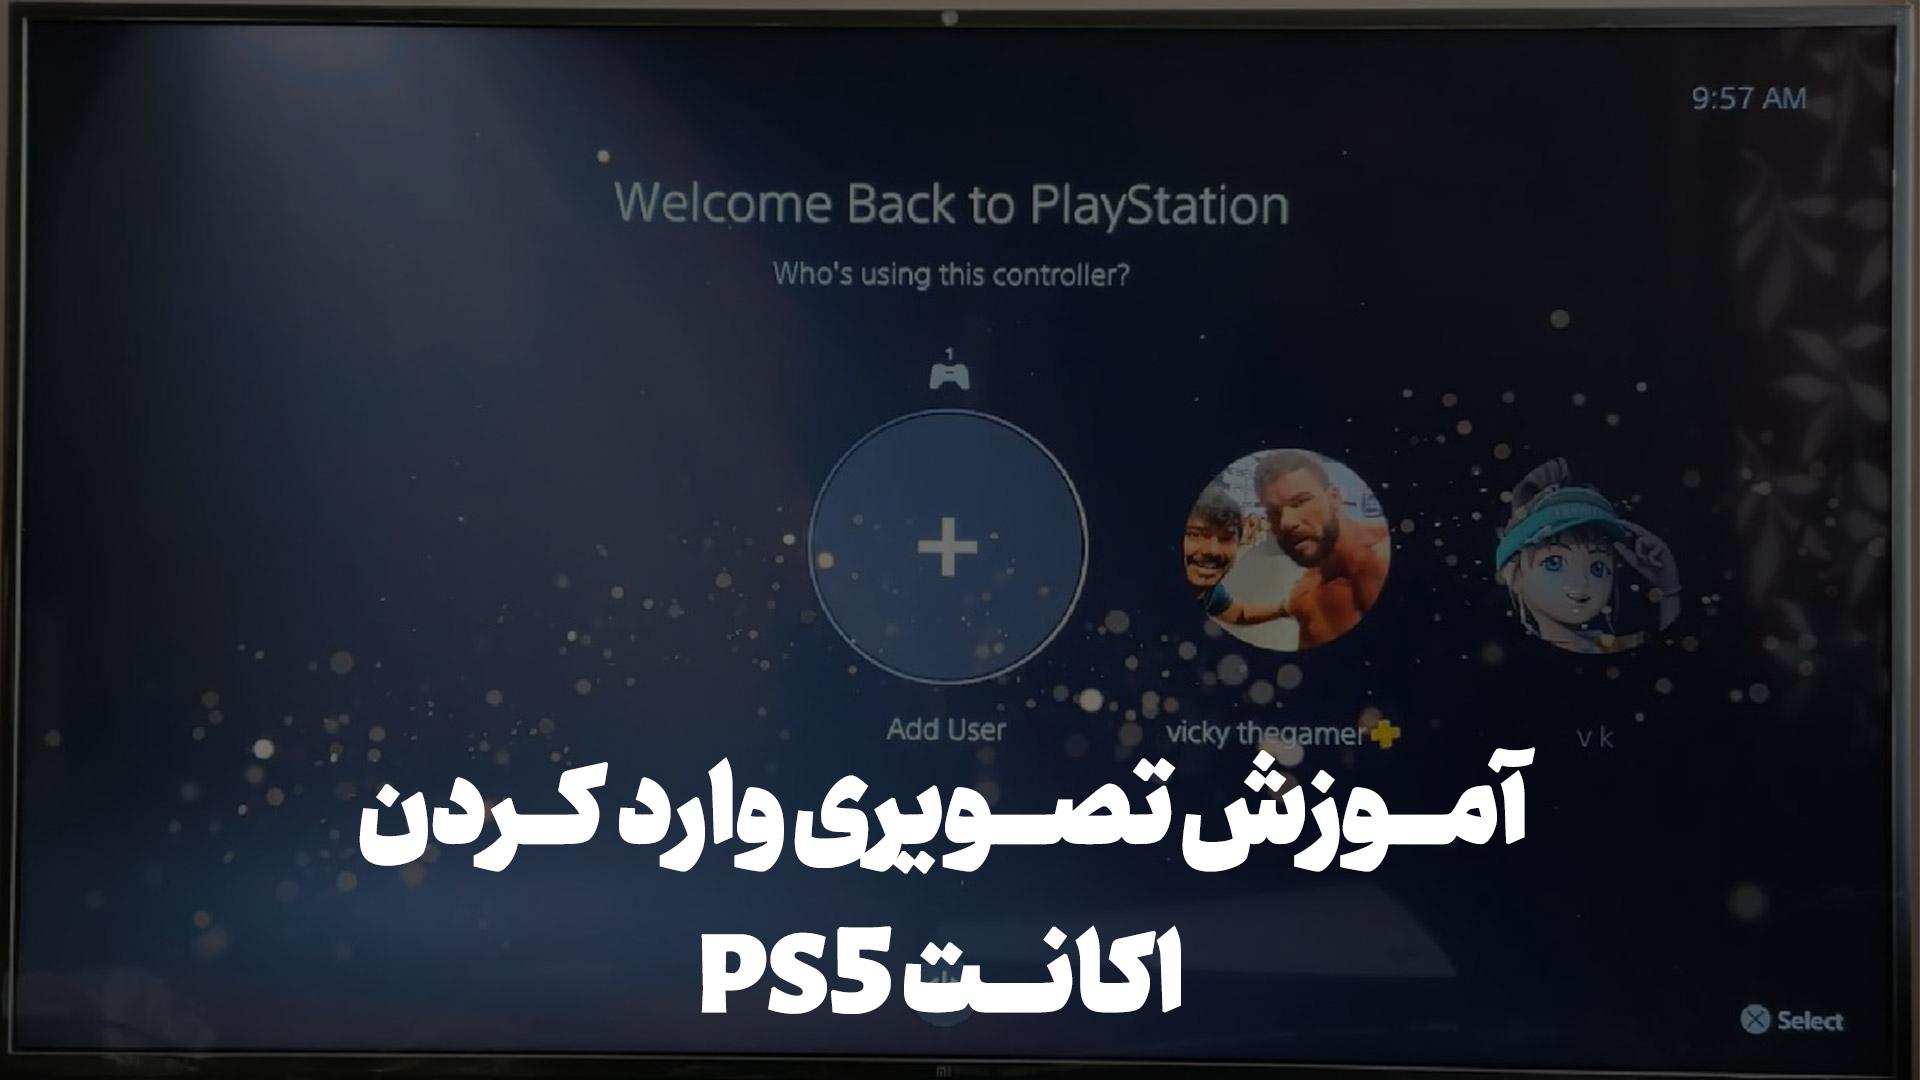 PS5 Login